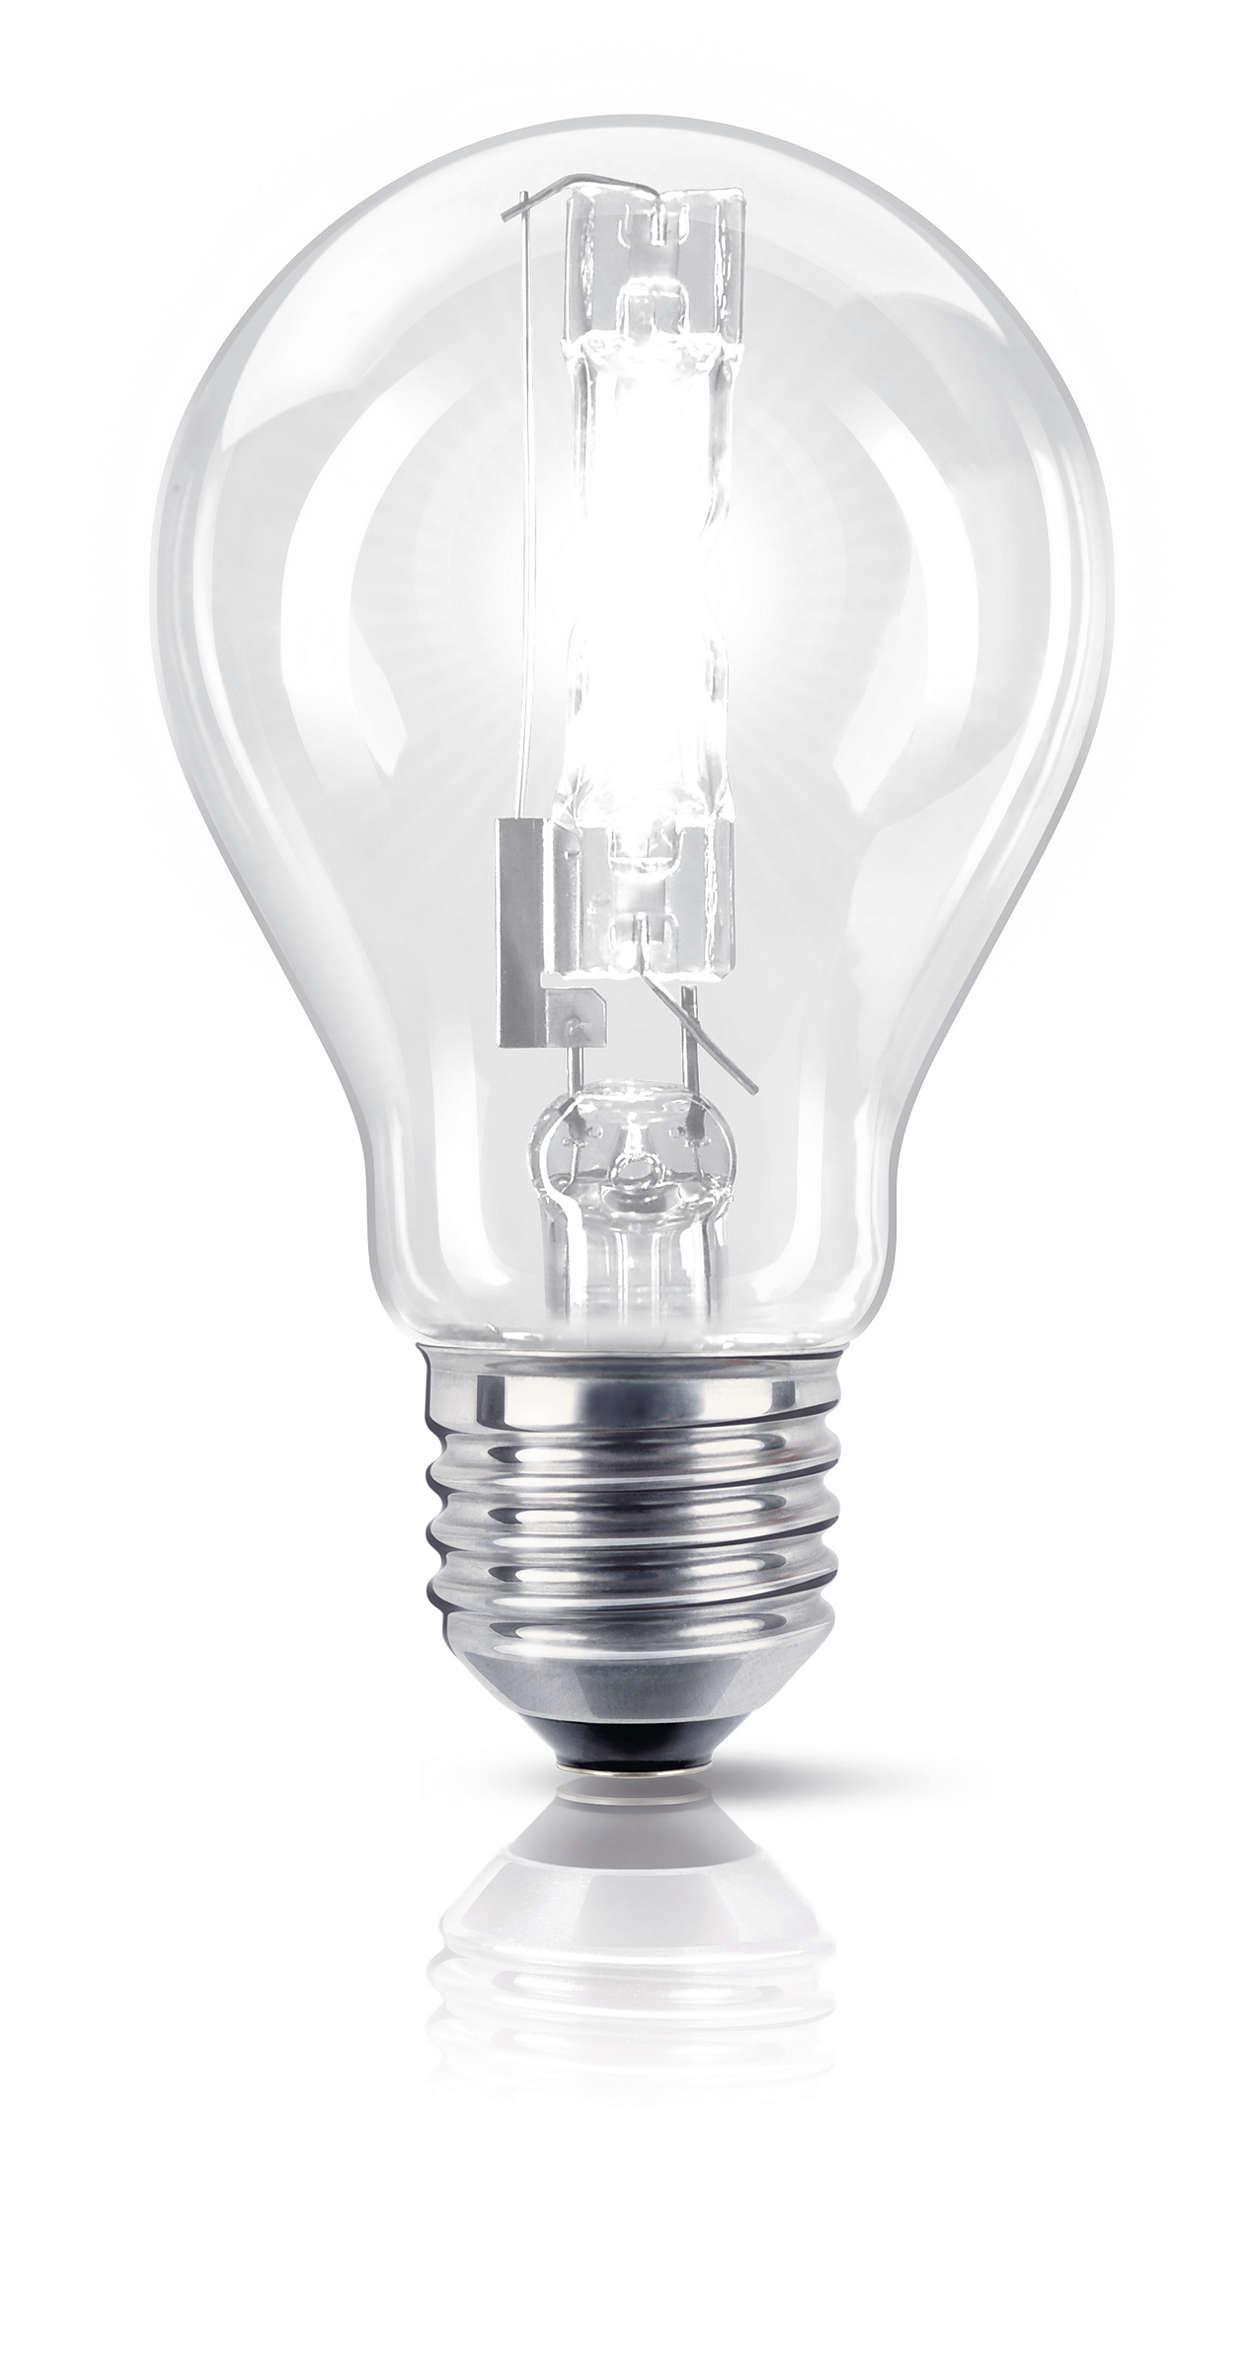 The NEW 經典燈泡